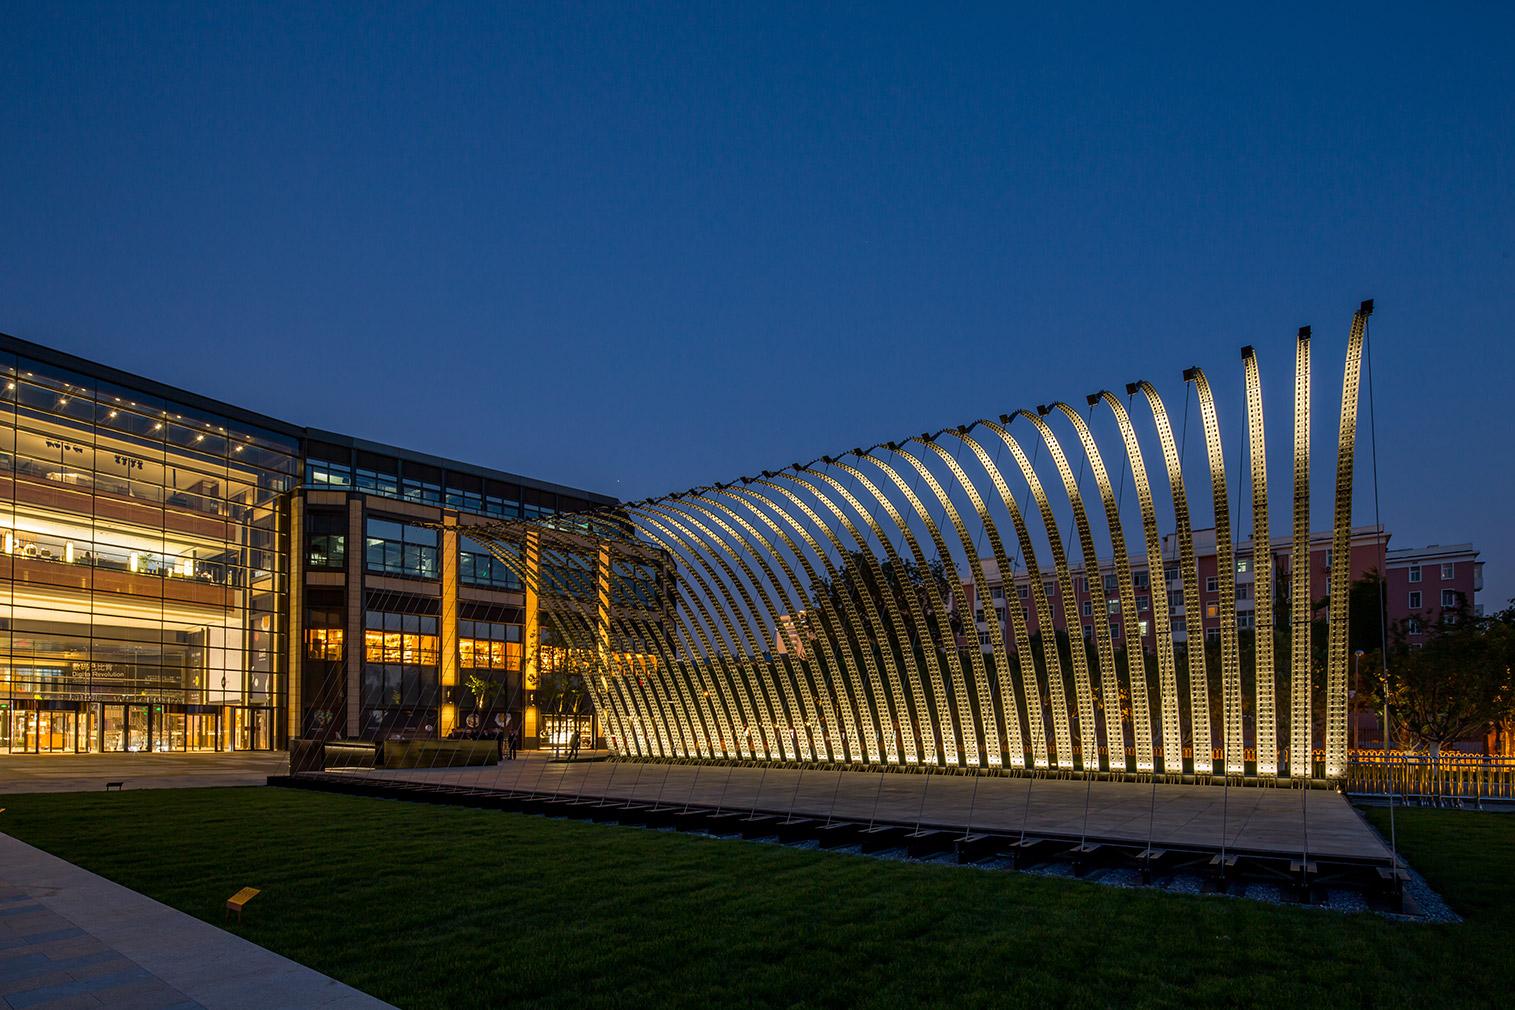 Serpentine-Pavilion-Beijing-ben_0660